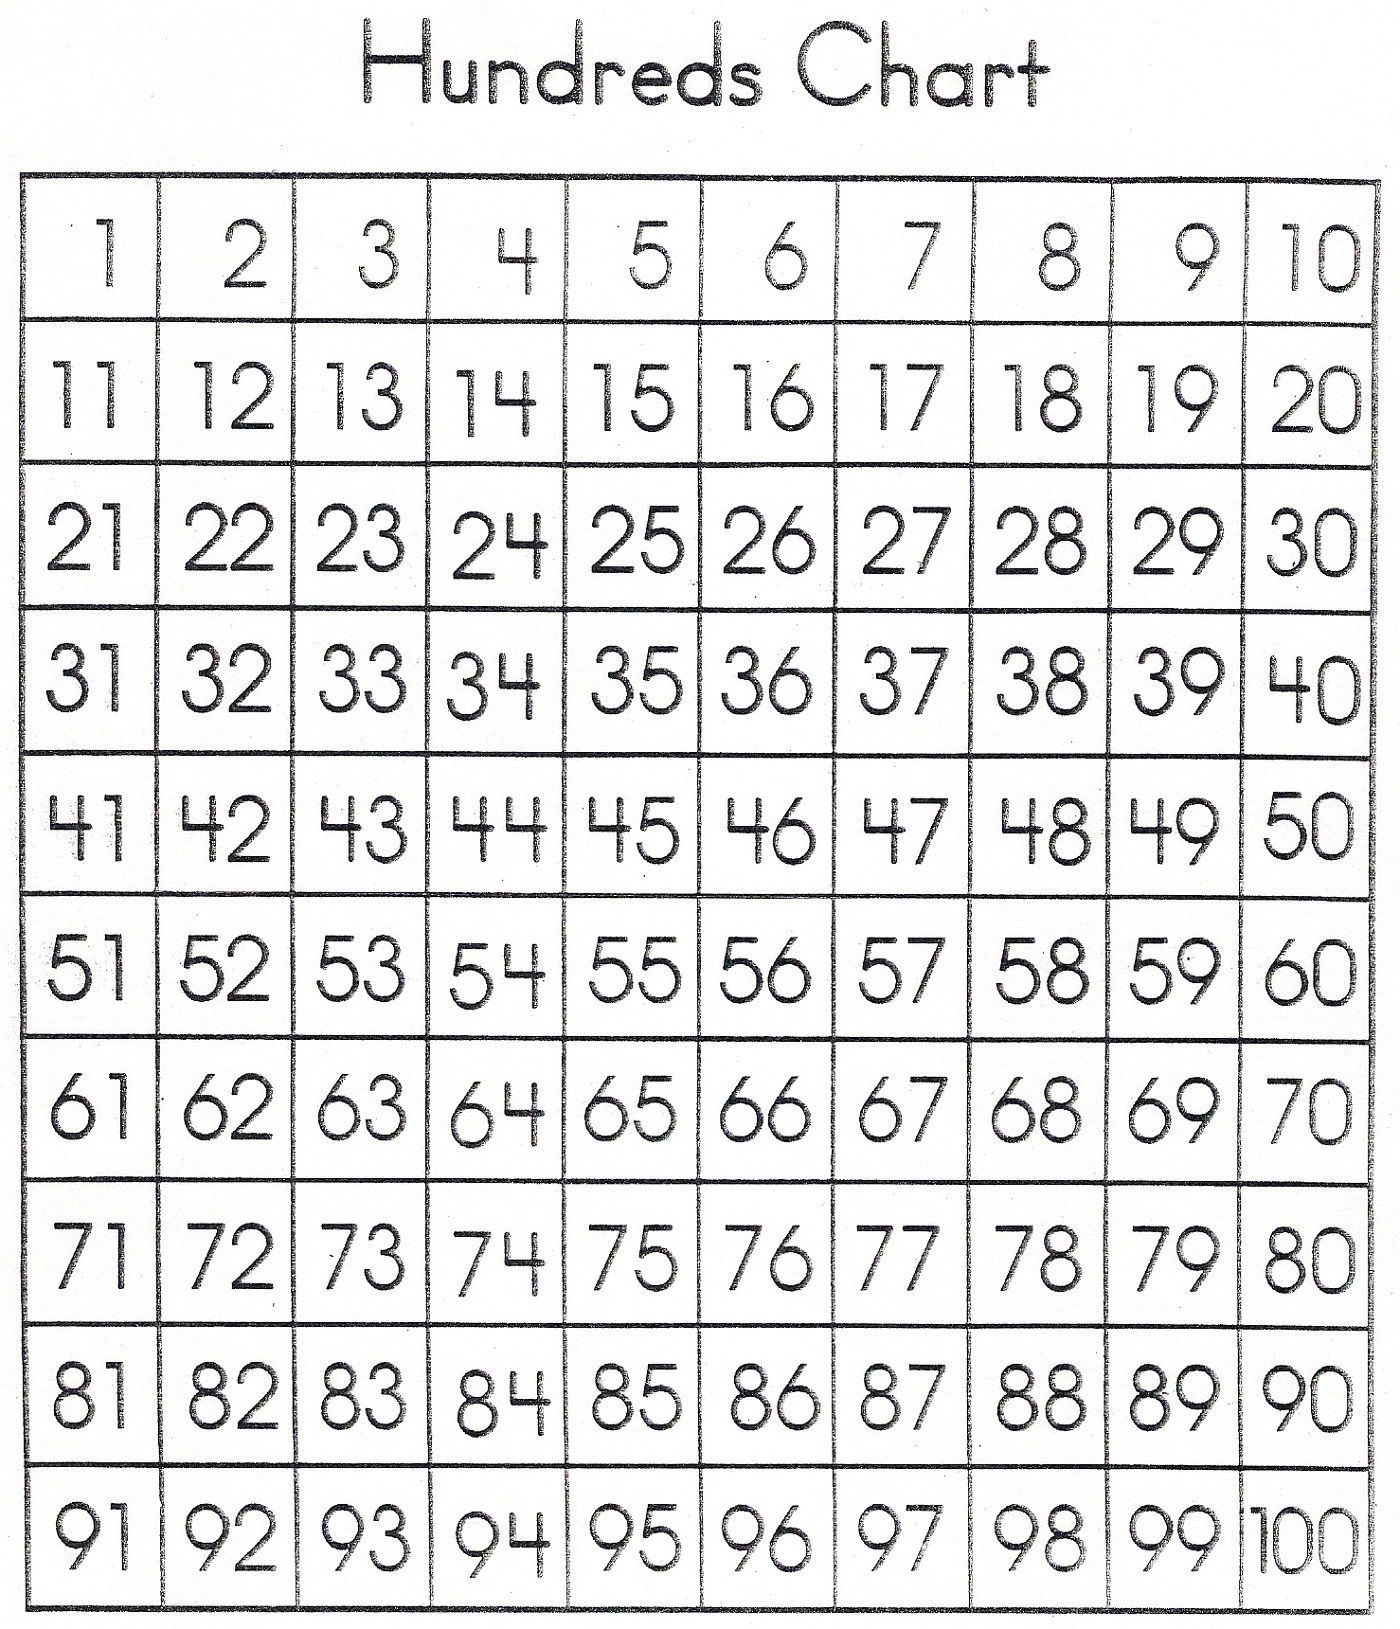 1-100 Number Chart Printable | 101 Printable In 2020 | 100